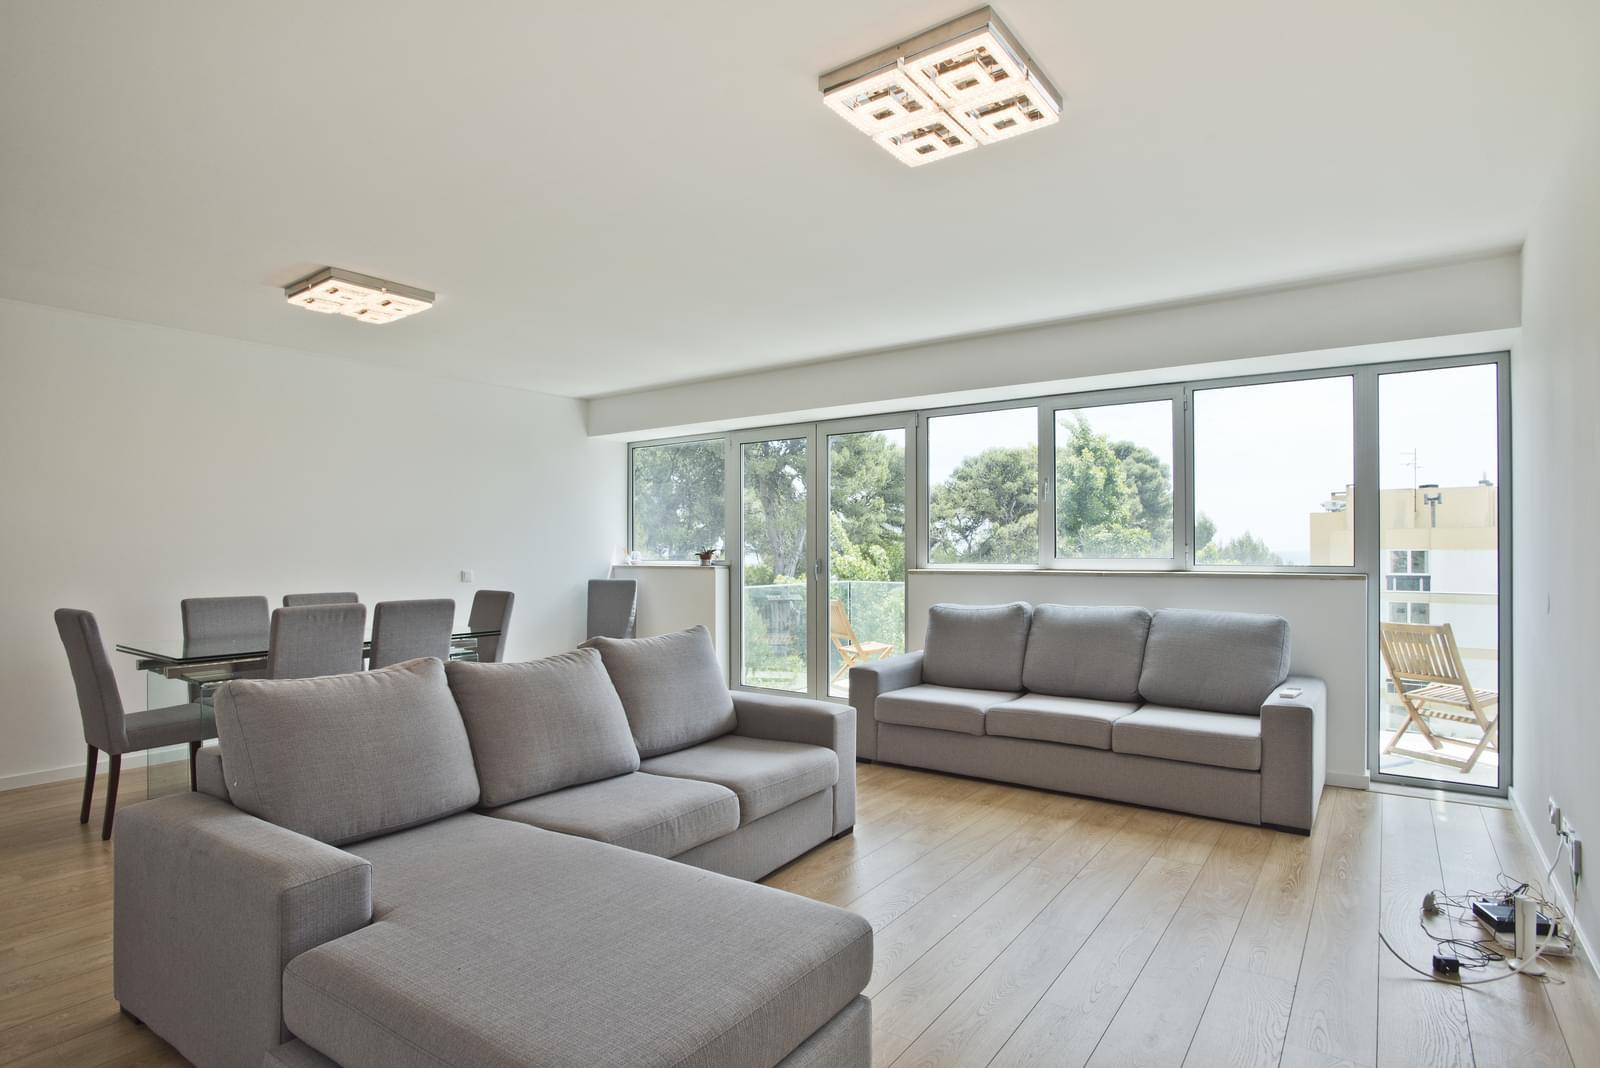 pf13975-apartamento-t4-oeiras-d28acd81-56de-4d81-9d44-841d4cef4585